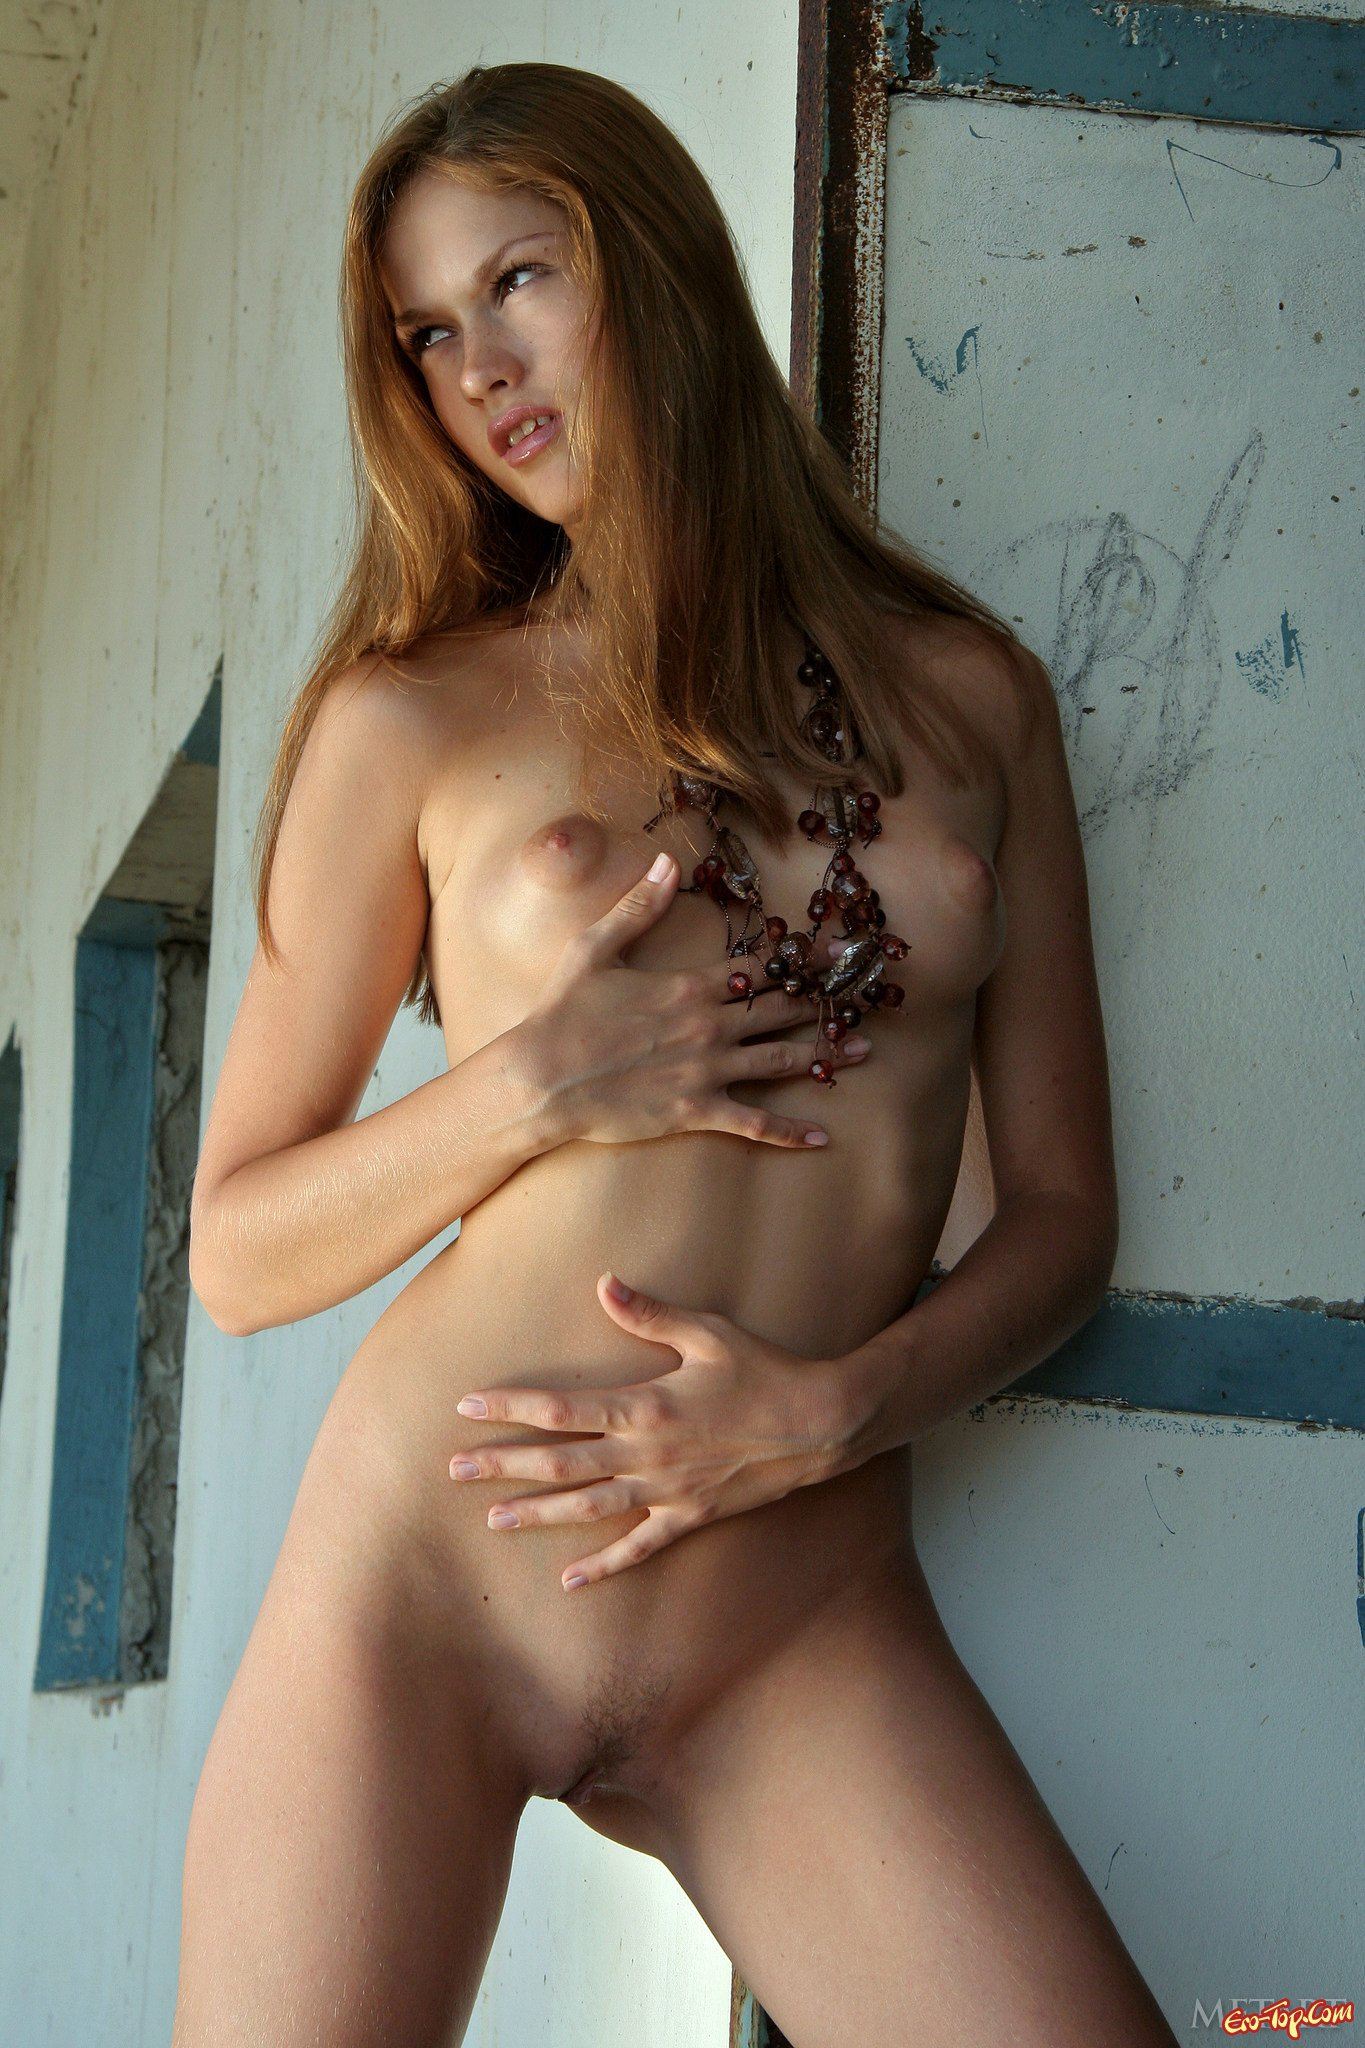 Фото голых девушек из беларуси шевченко